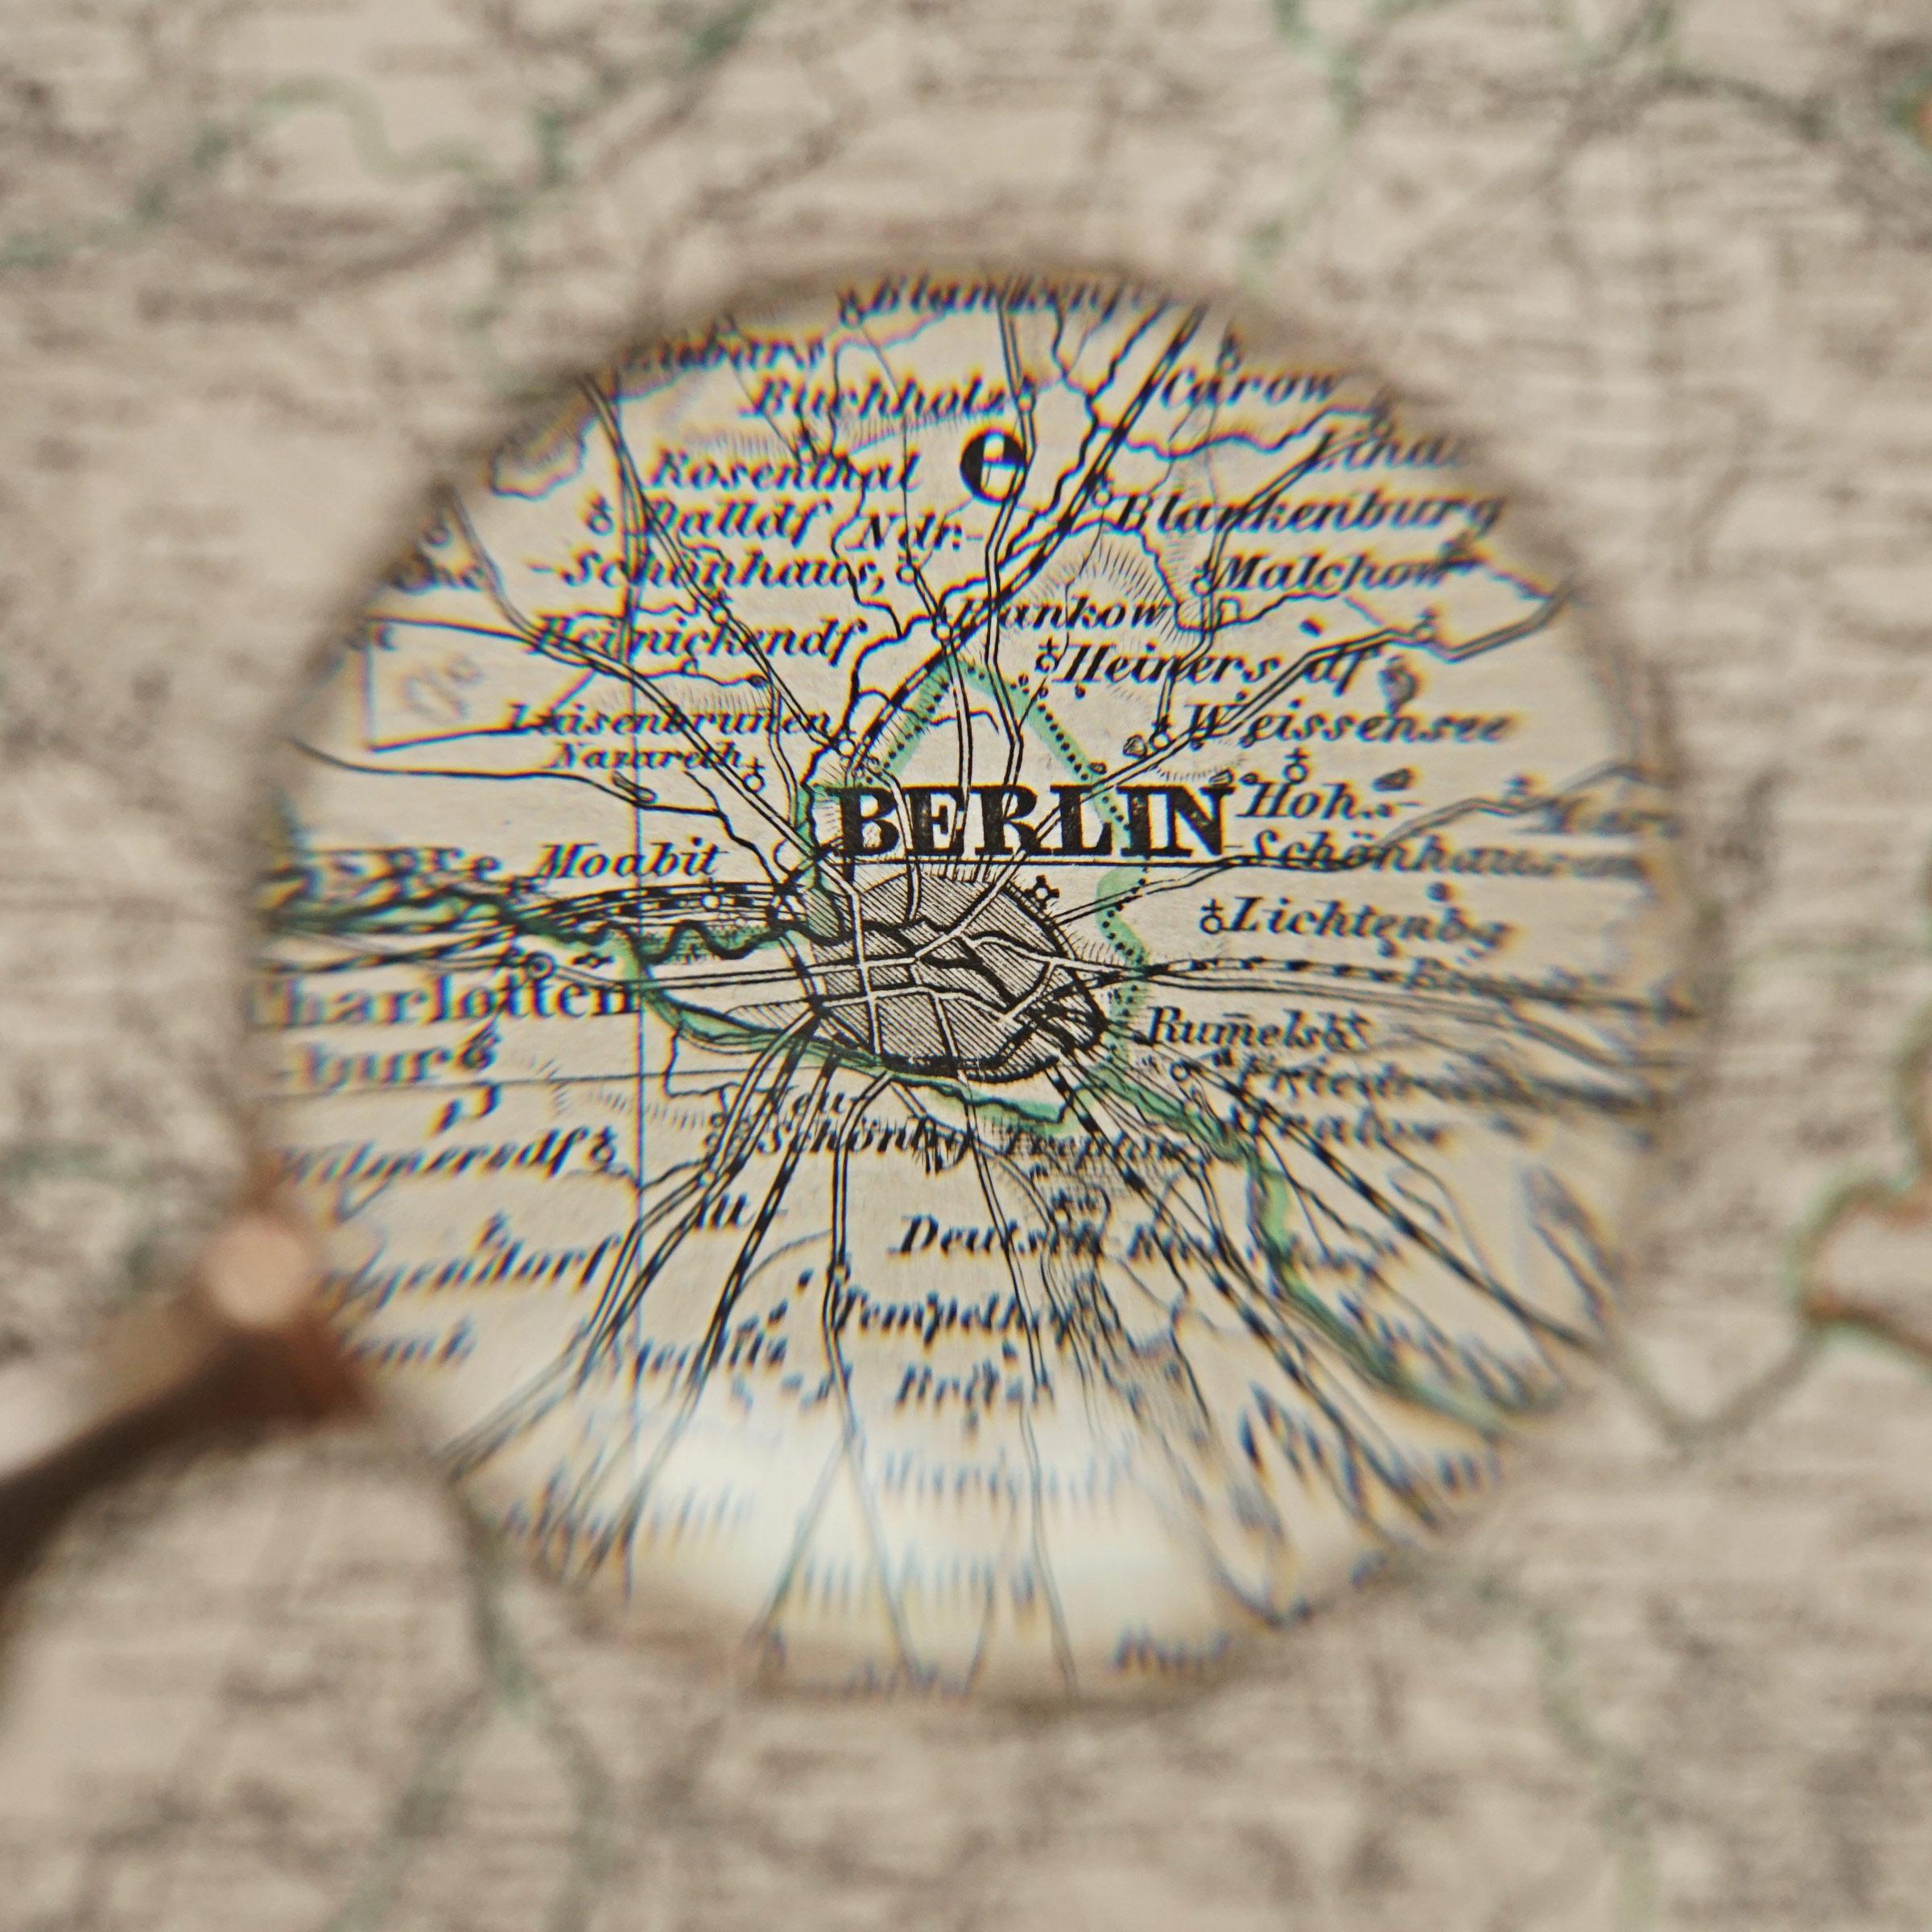 Closeup of Berlin - Kieperts Grosser Handatlas des Himmels und der Erde